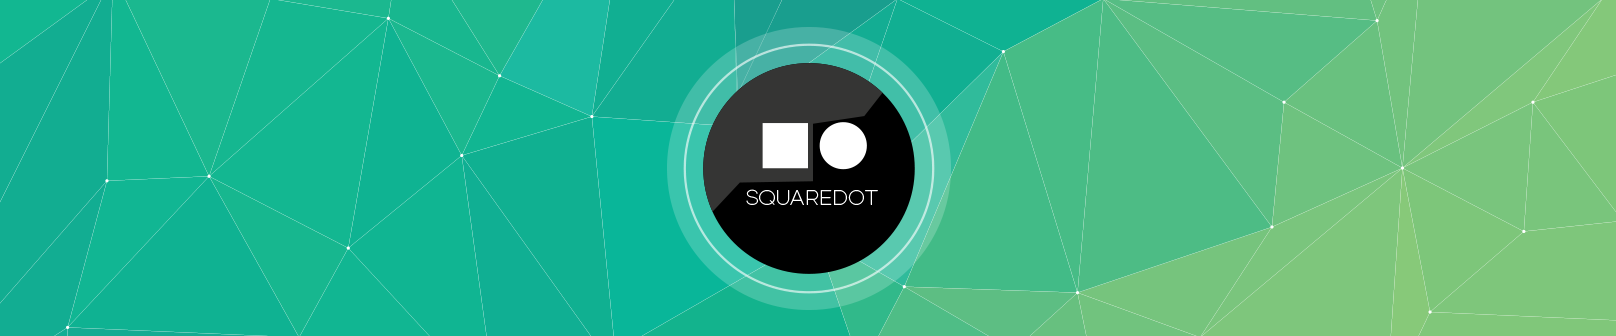 Squaredot, Best B2b Inbound Marketing Agency in Dublin.